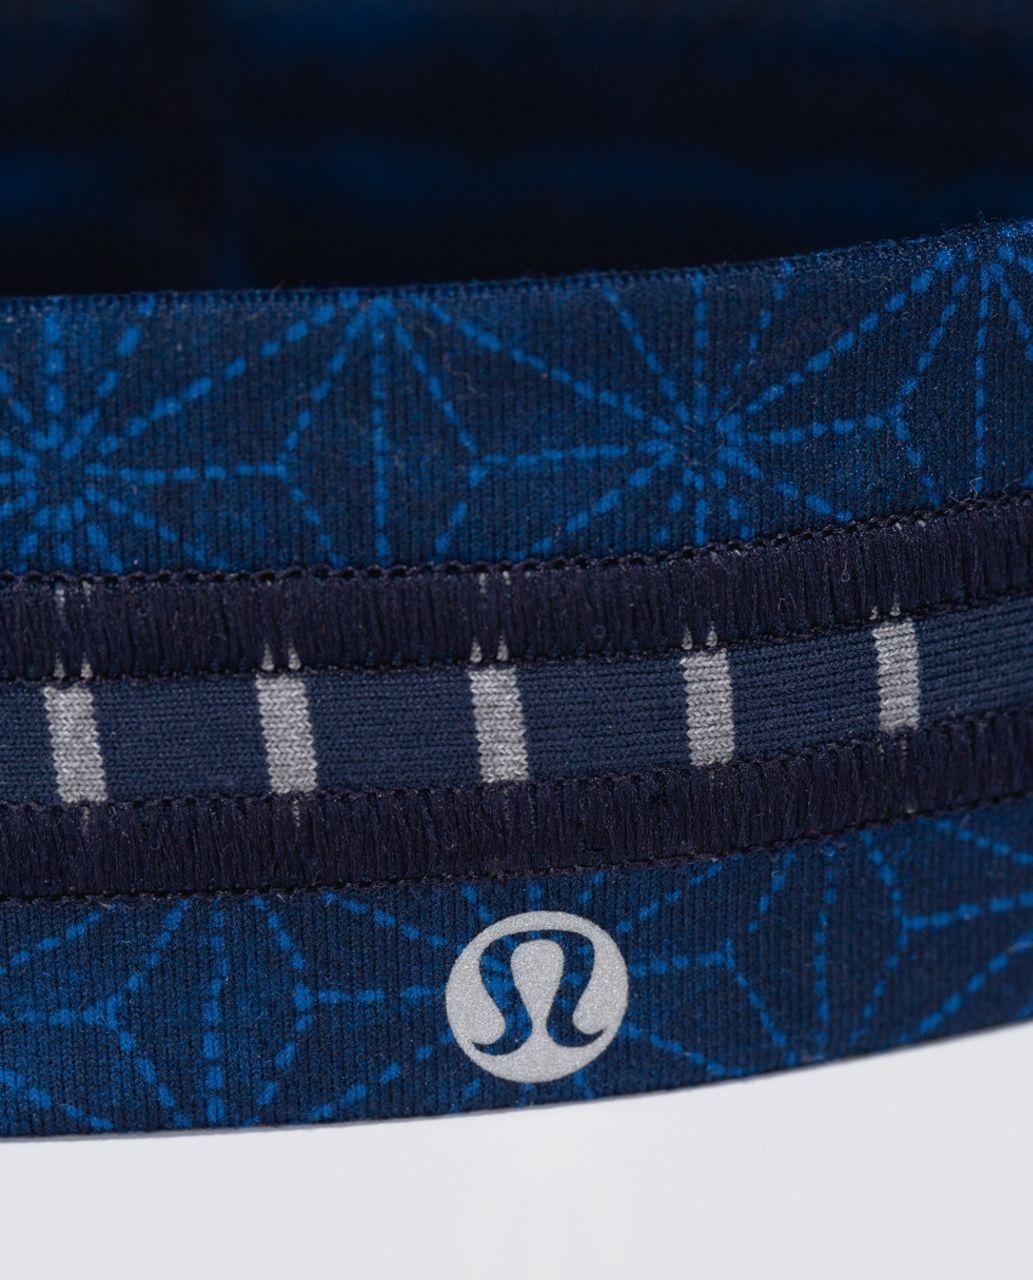 Lululemon Fly Away Tamer Headband *Quilt - Sashico Star Inkwell Rugged Blue / West2east Stripe Inkwell Heathered Slate